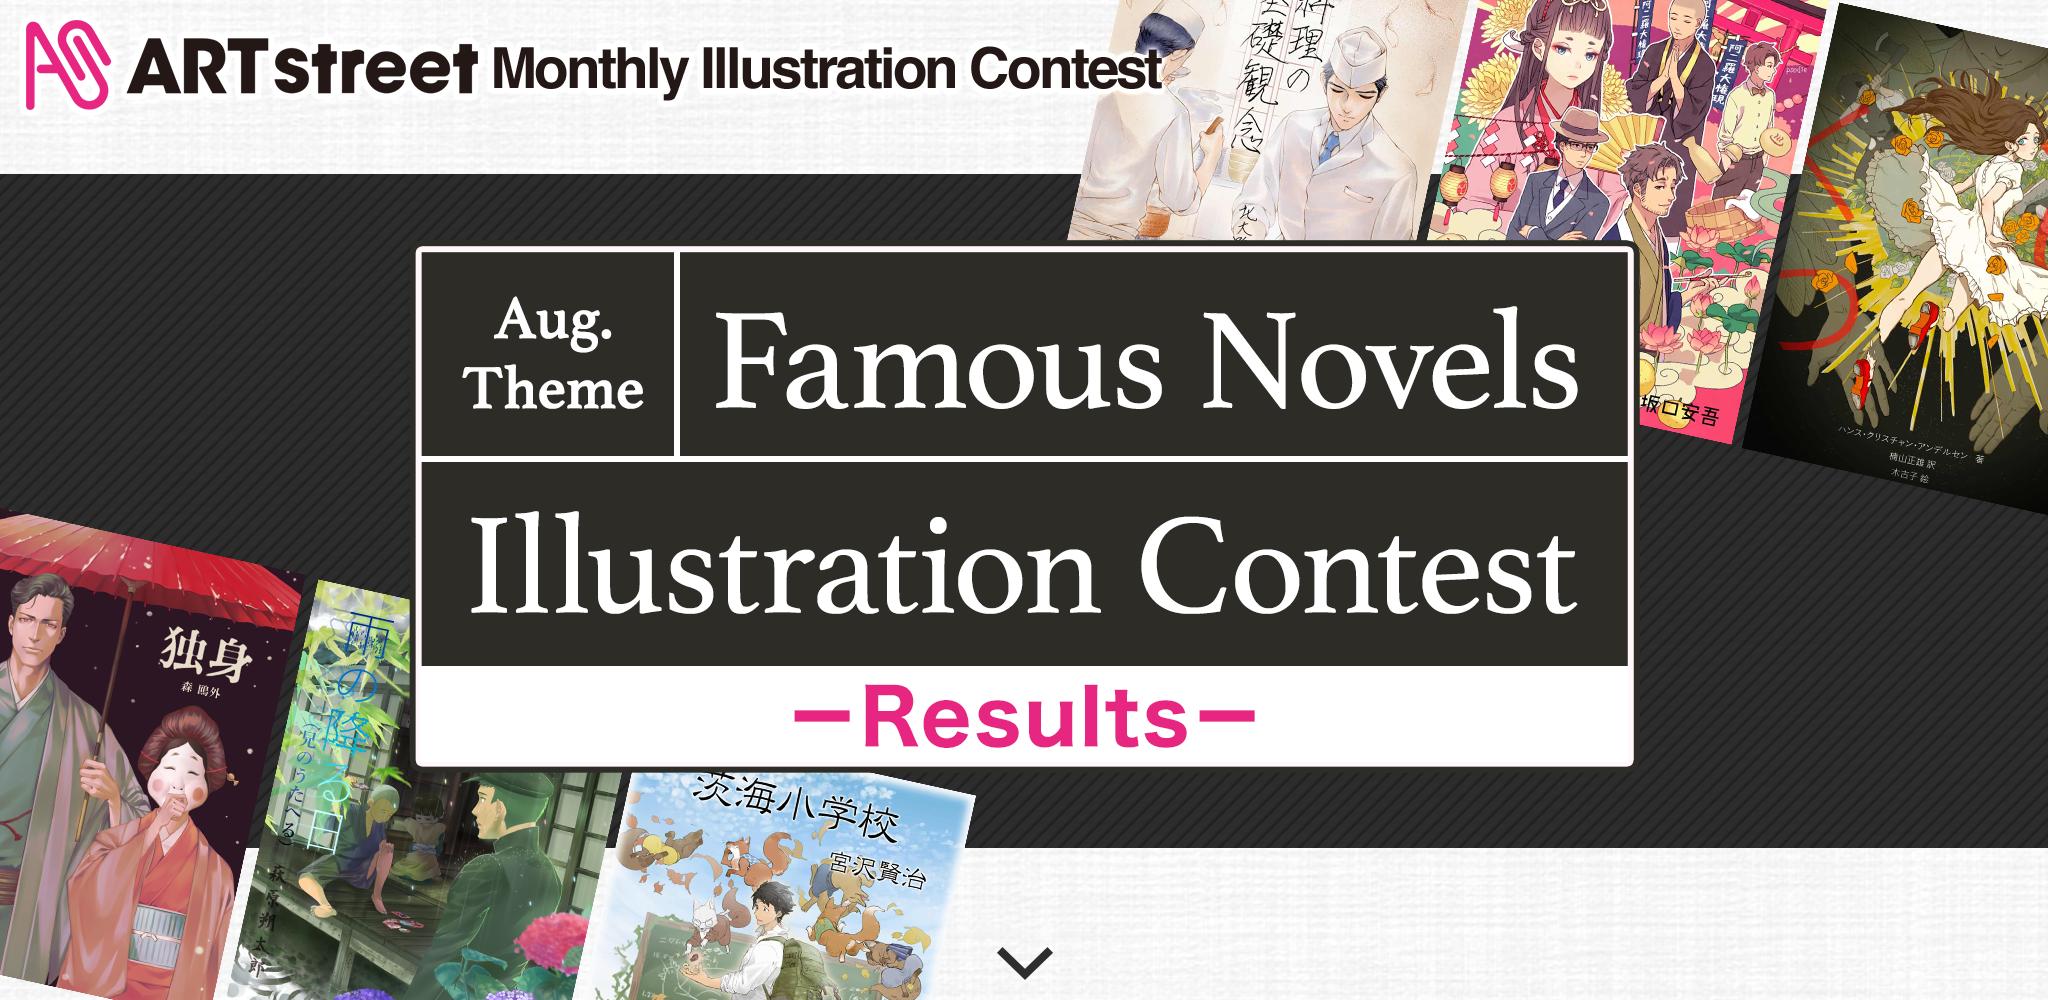 ART street Monthly Illustration Contest August 2019 Results | Contest - Art Street (ART street) by MediBang